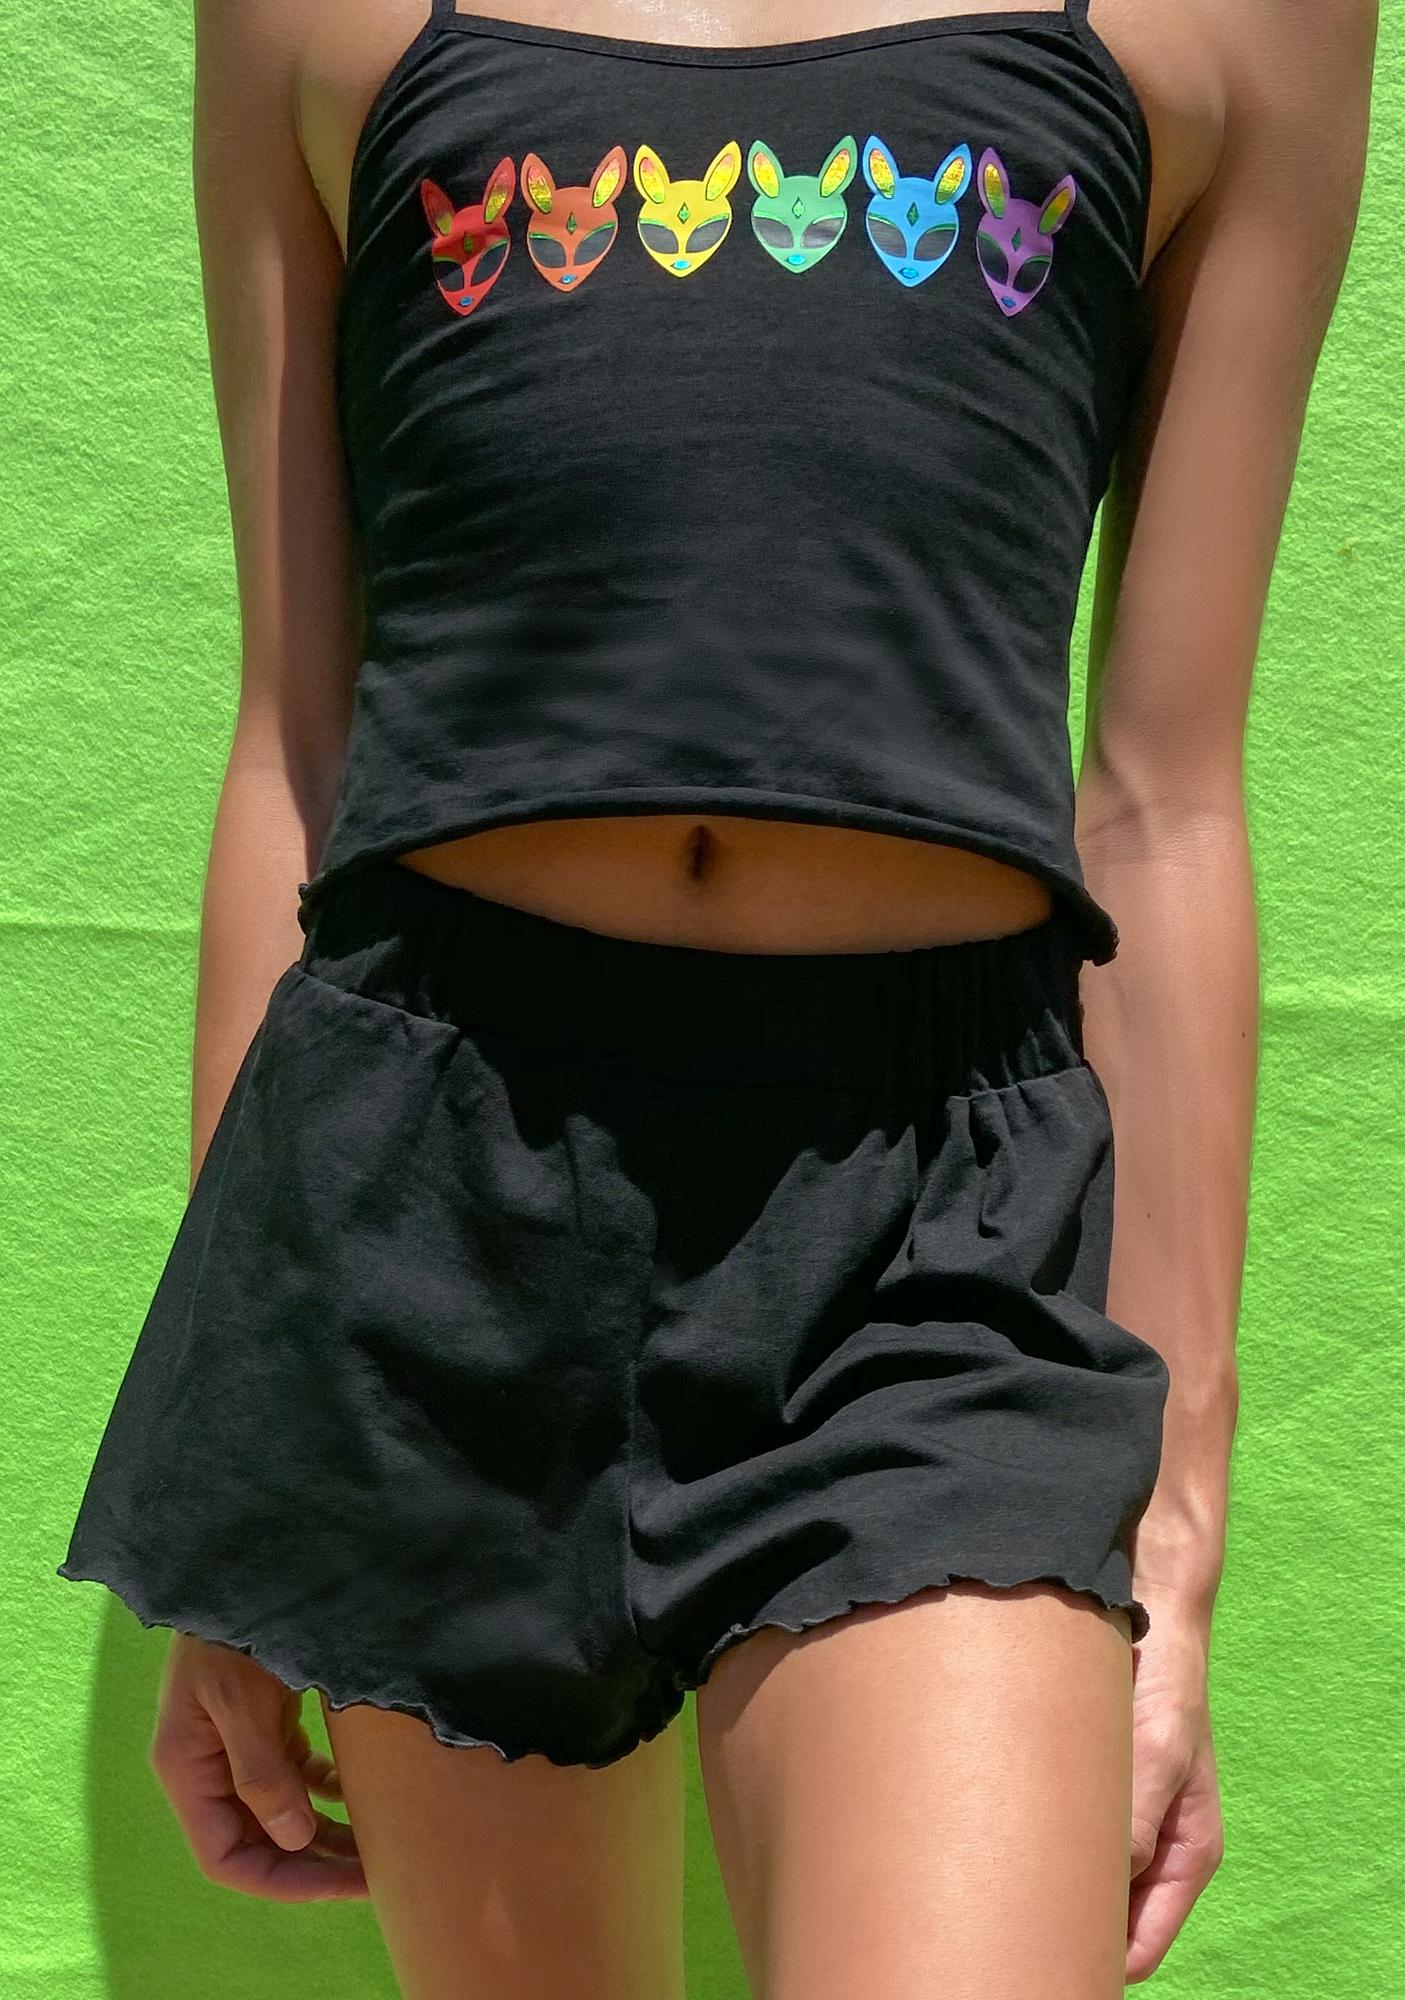 Club Exx Misfits Unite Lounge Shorts